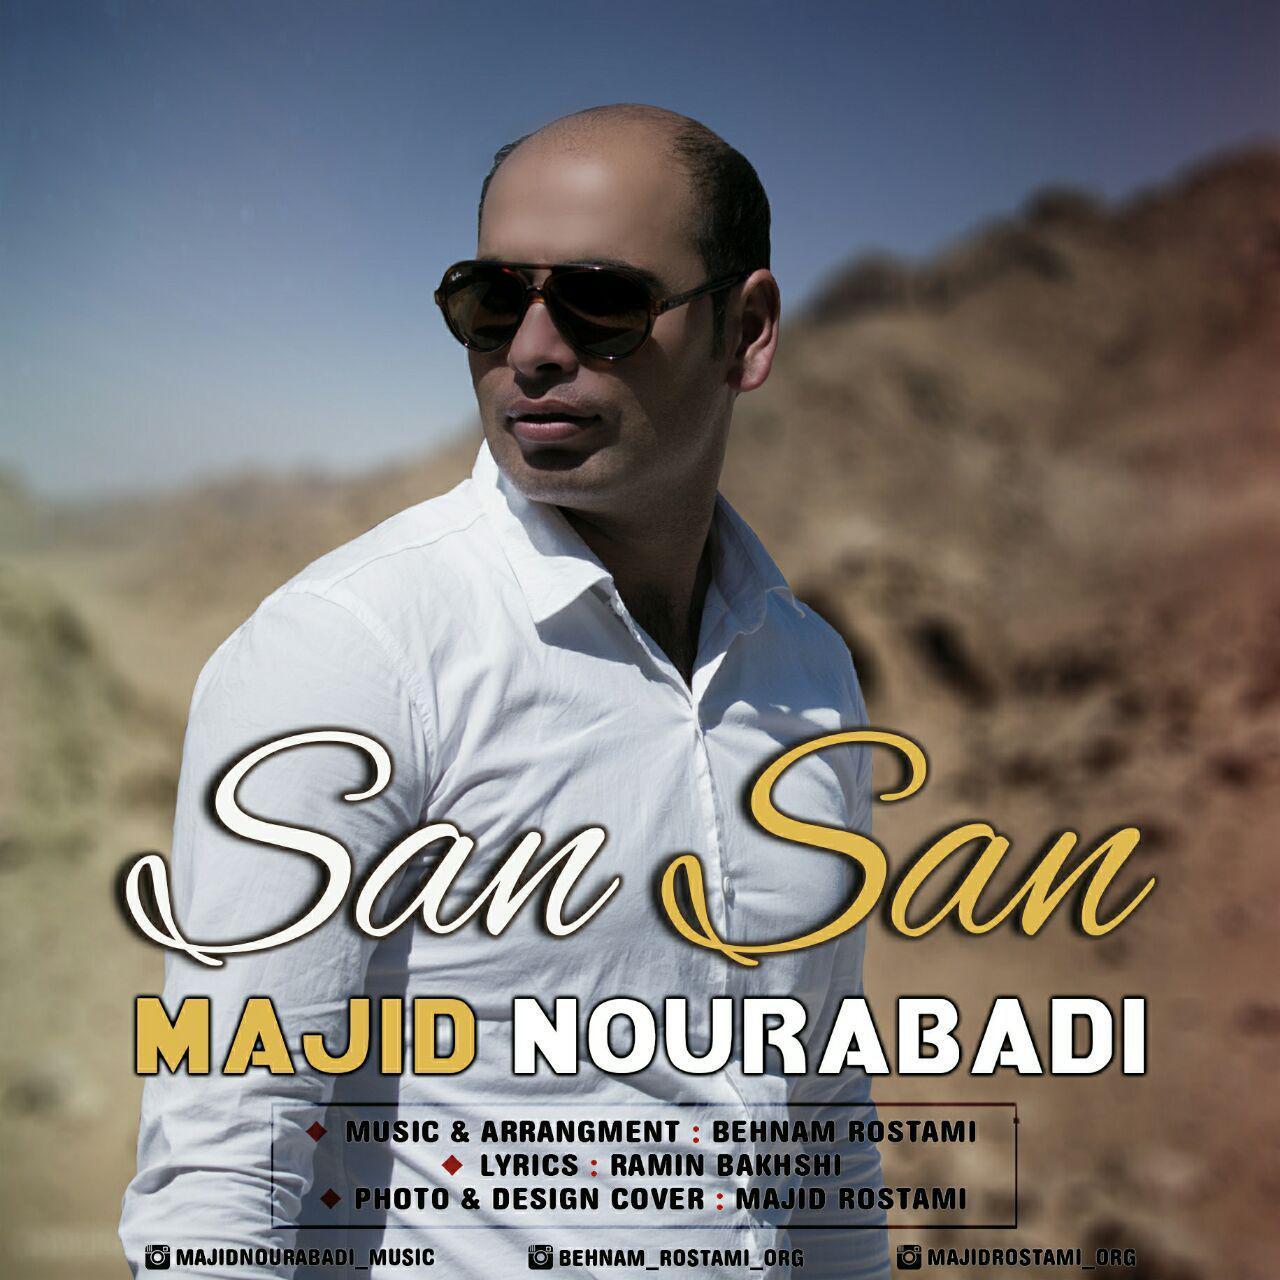 http://birtunes.ir/wp-content/uploads/2018/10/Majid-Nourabadi-San-San.jpg